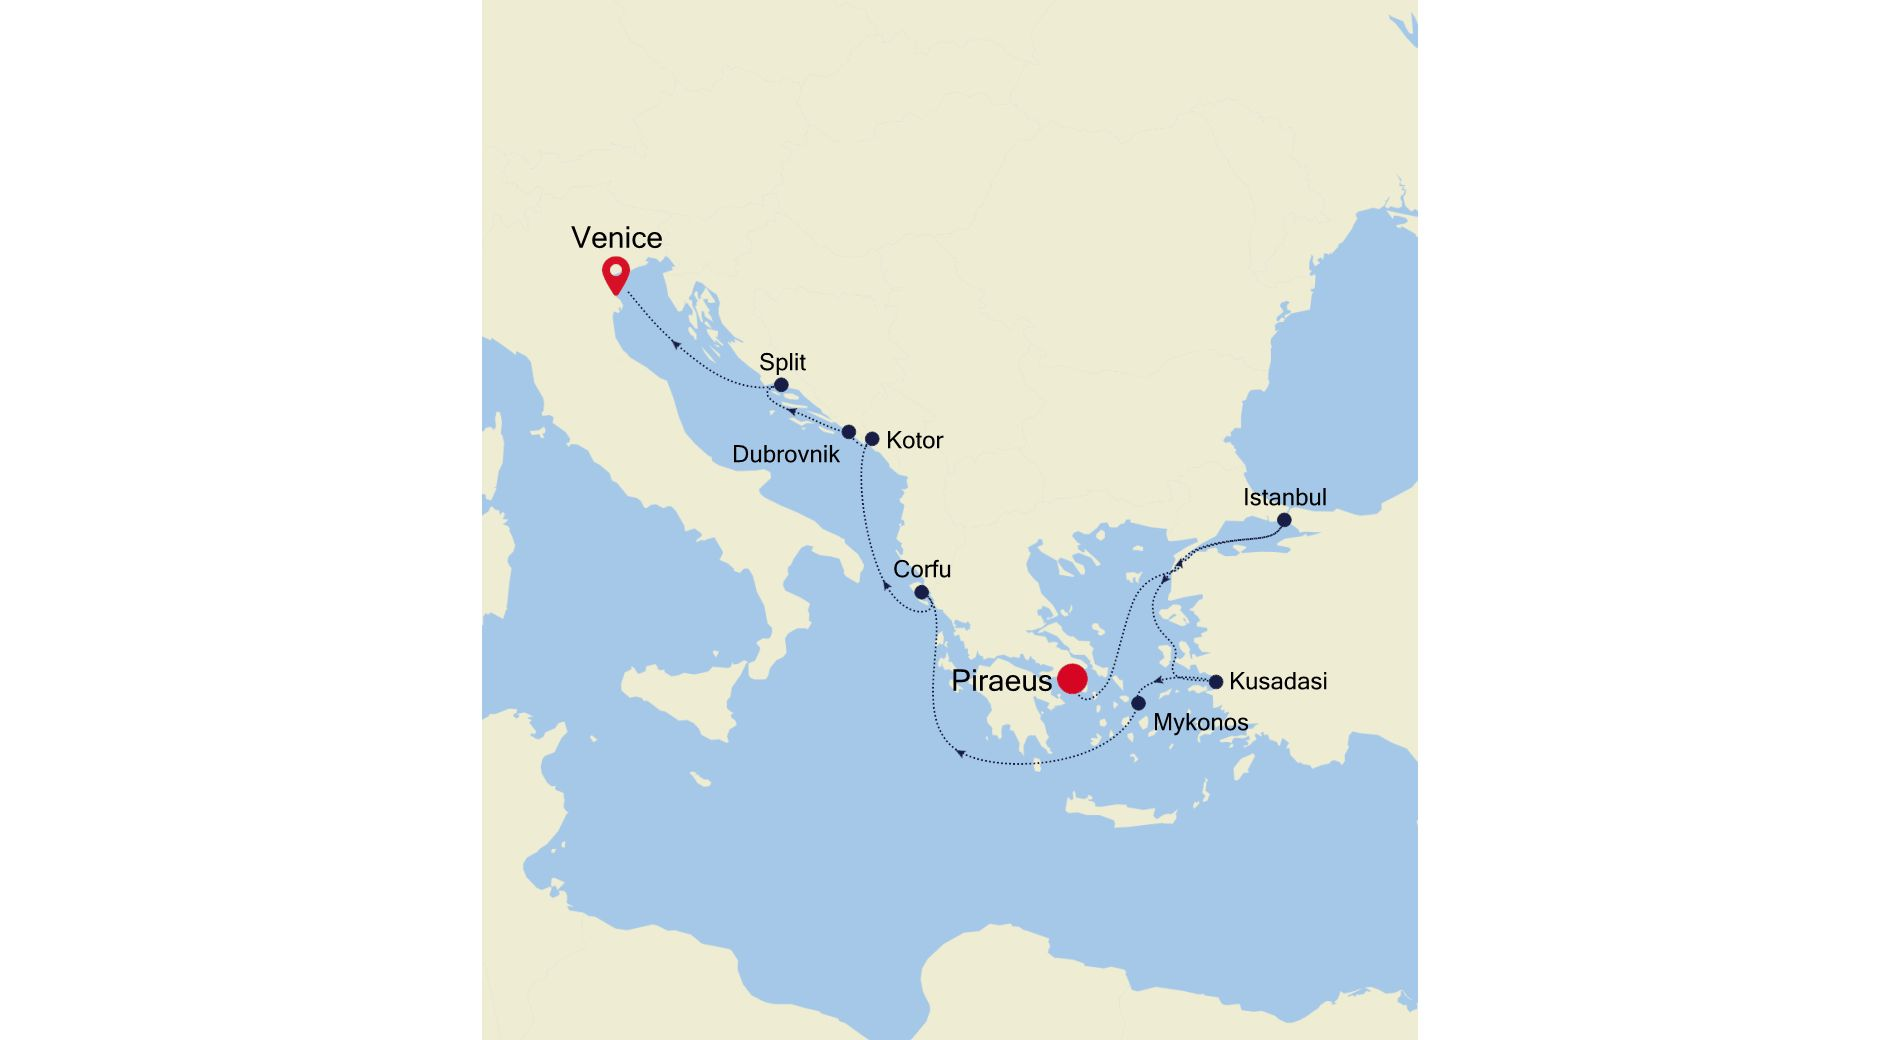 SS200802012 - Athens à Venice